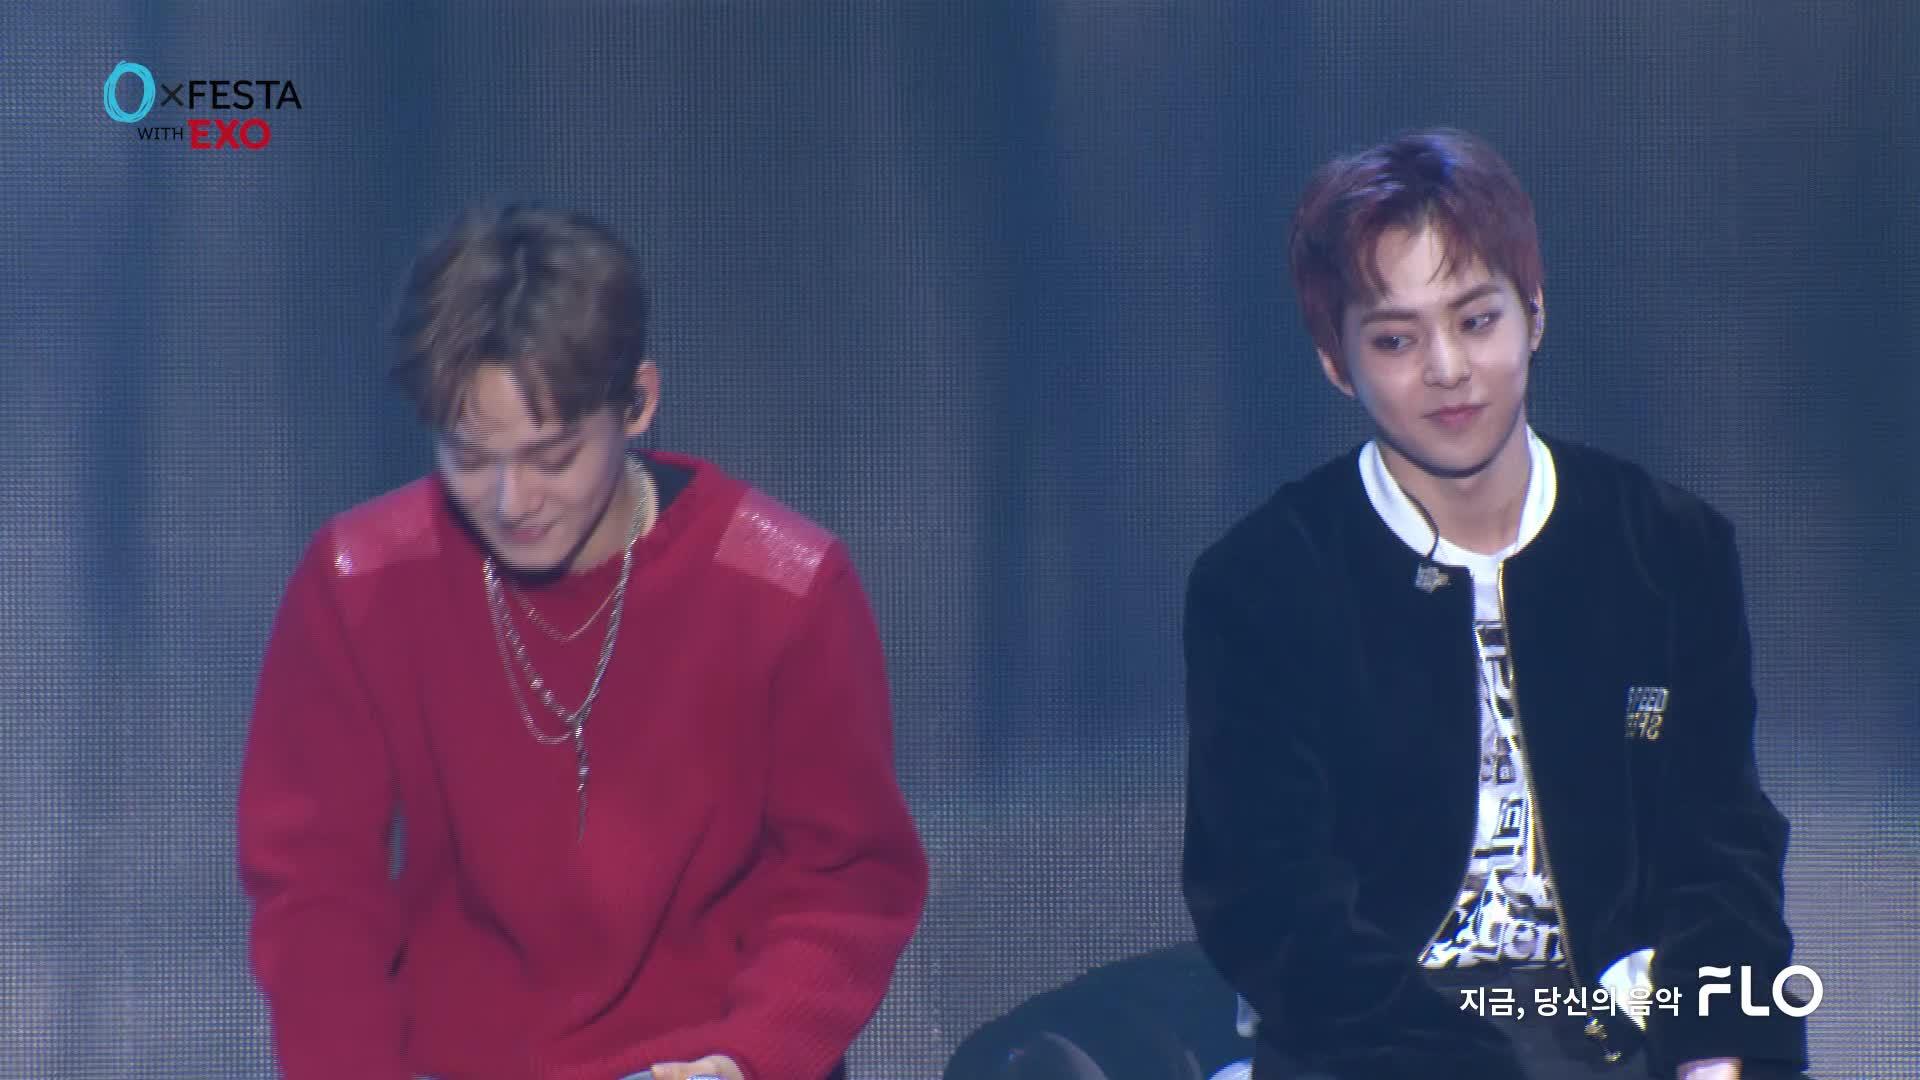 [0xFESTA with EXO #1] 엑소 대유잼 토크파티